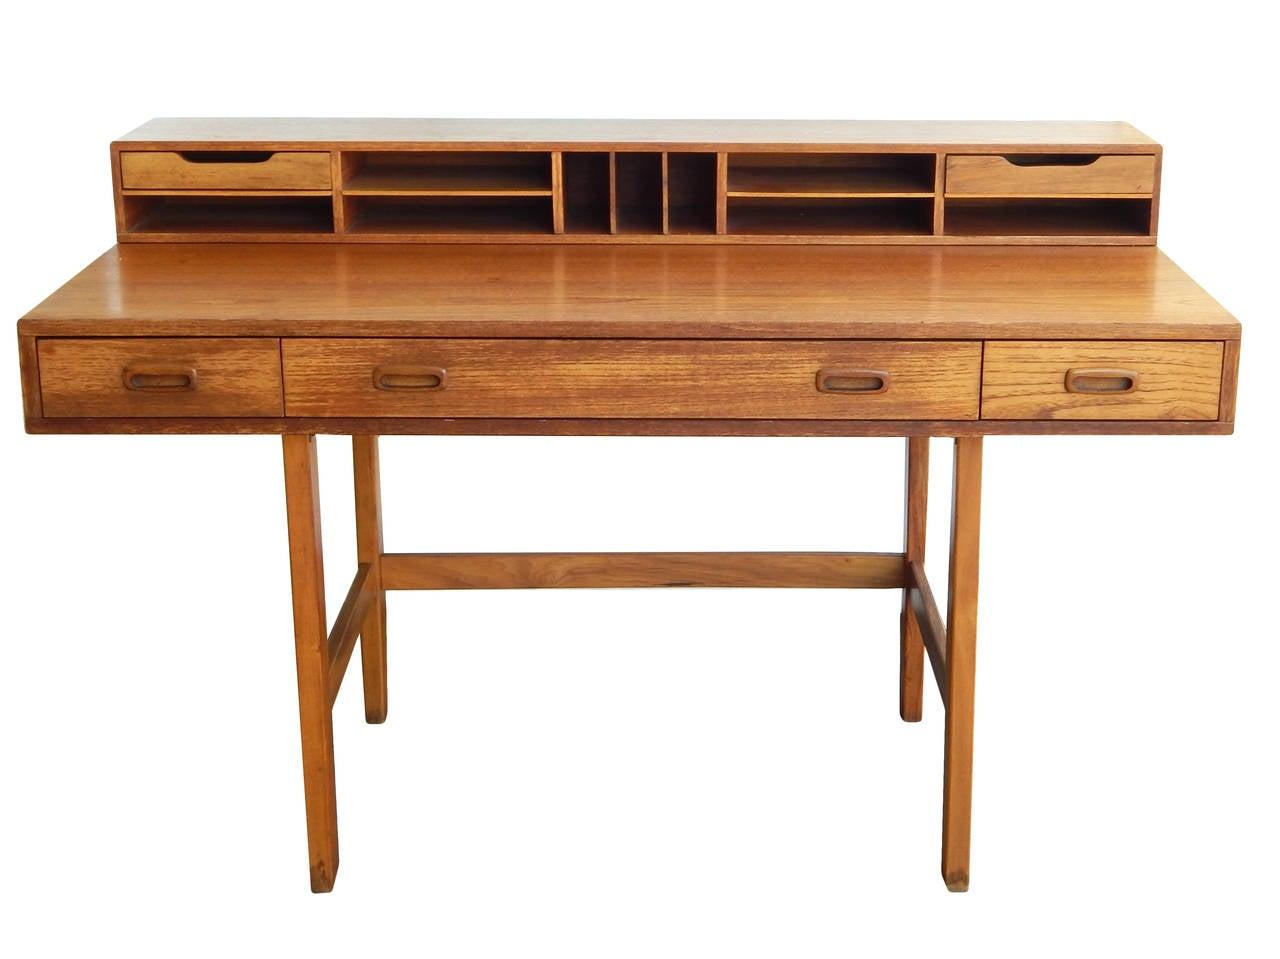 MidCentury Modern Convertible Desk at 1stdibs